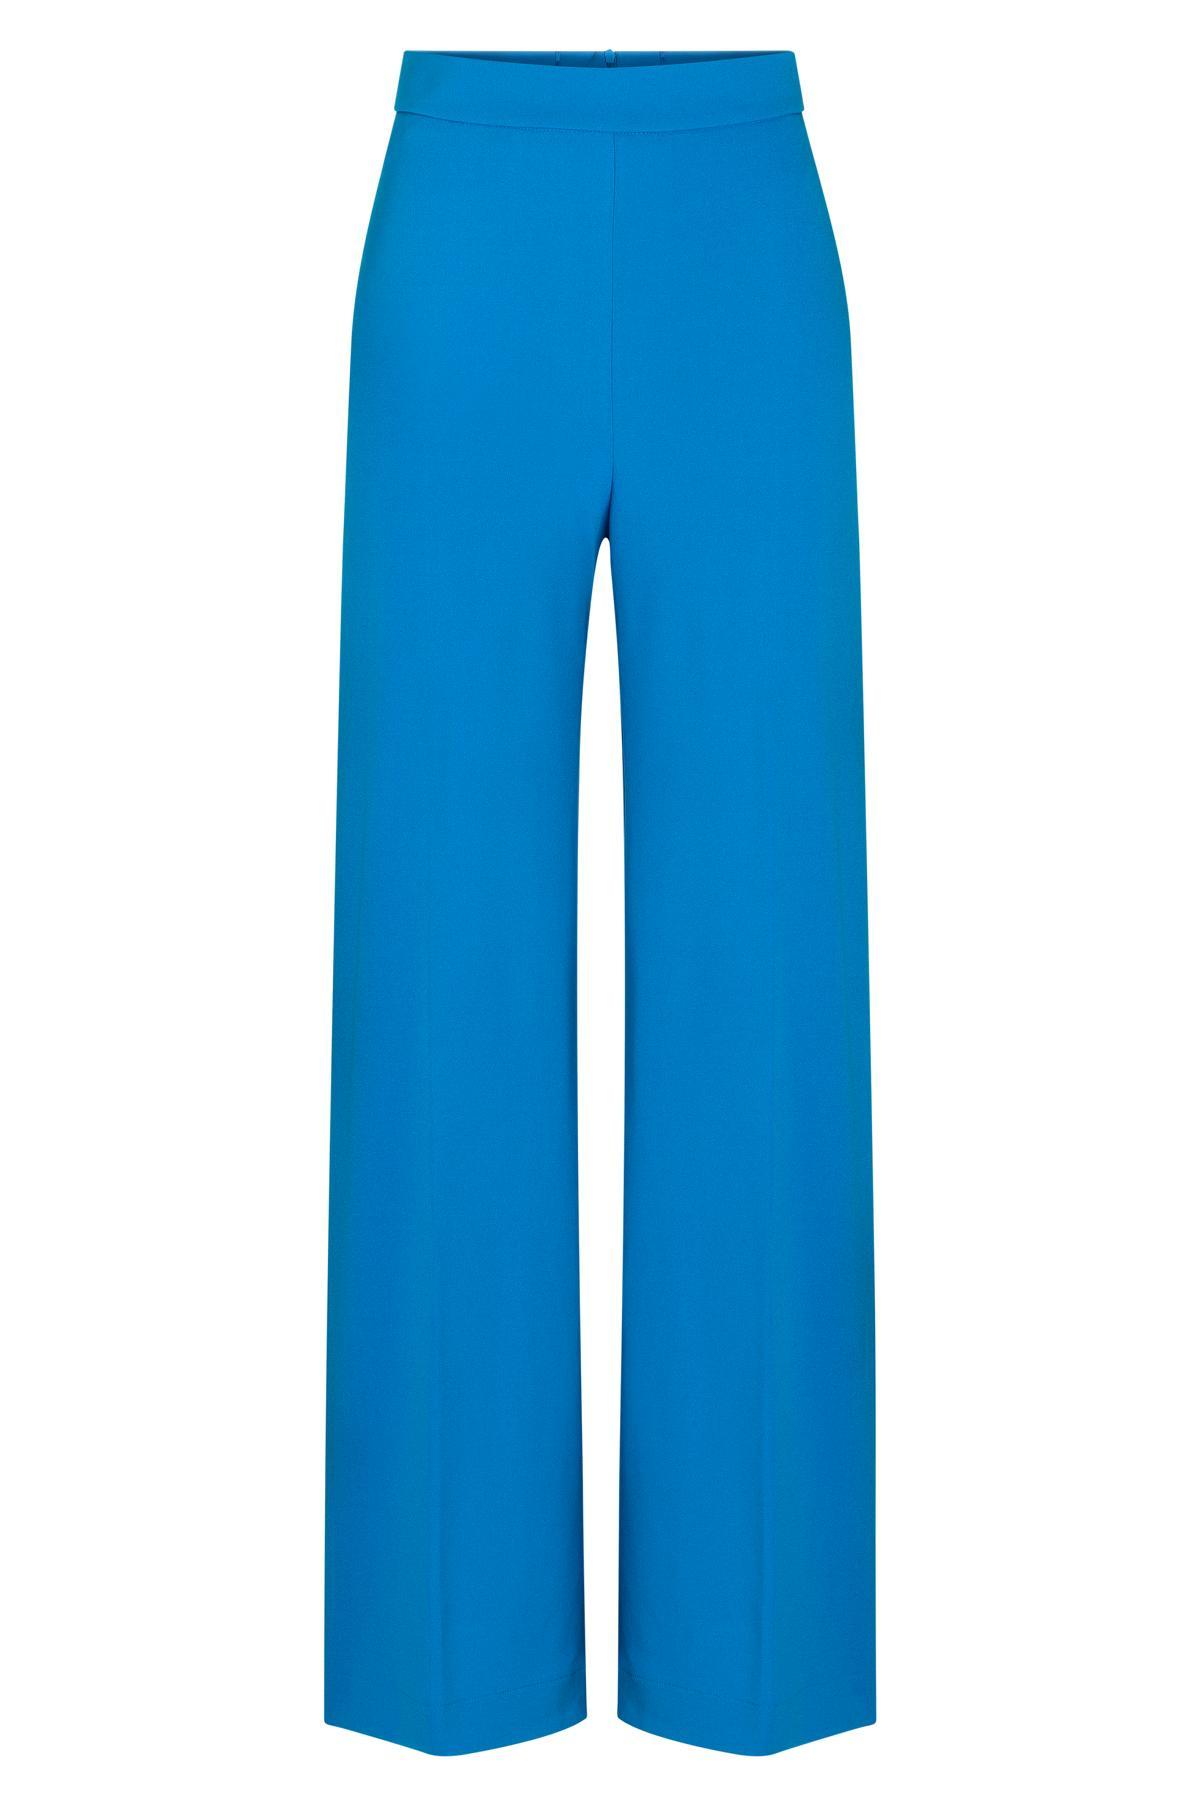 Ana Alcazar Wide Pants Sazosa Blue